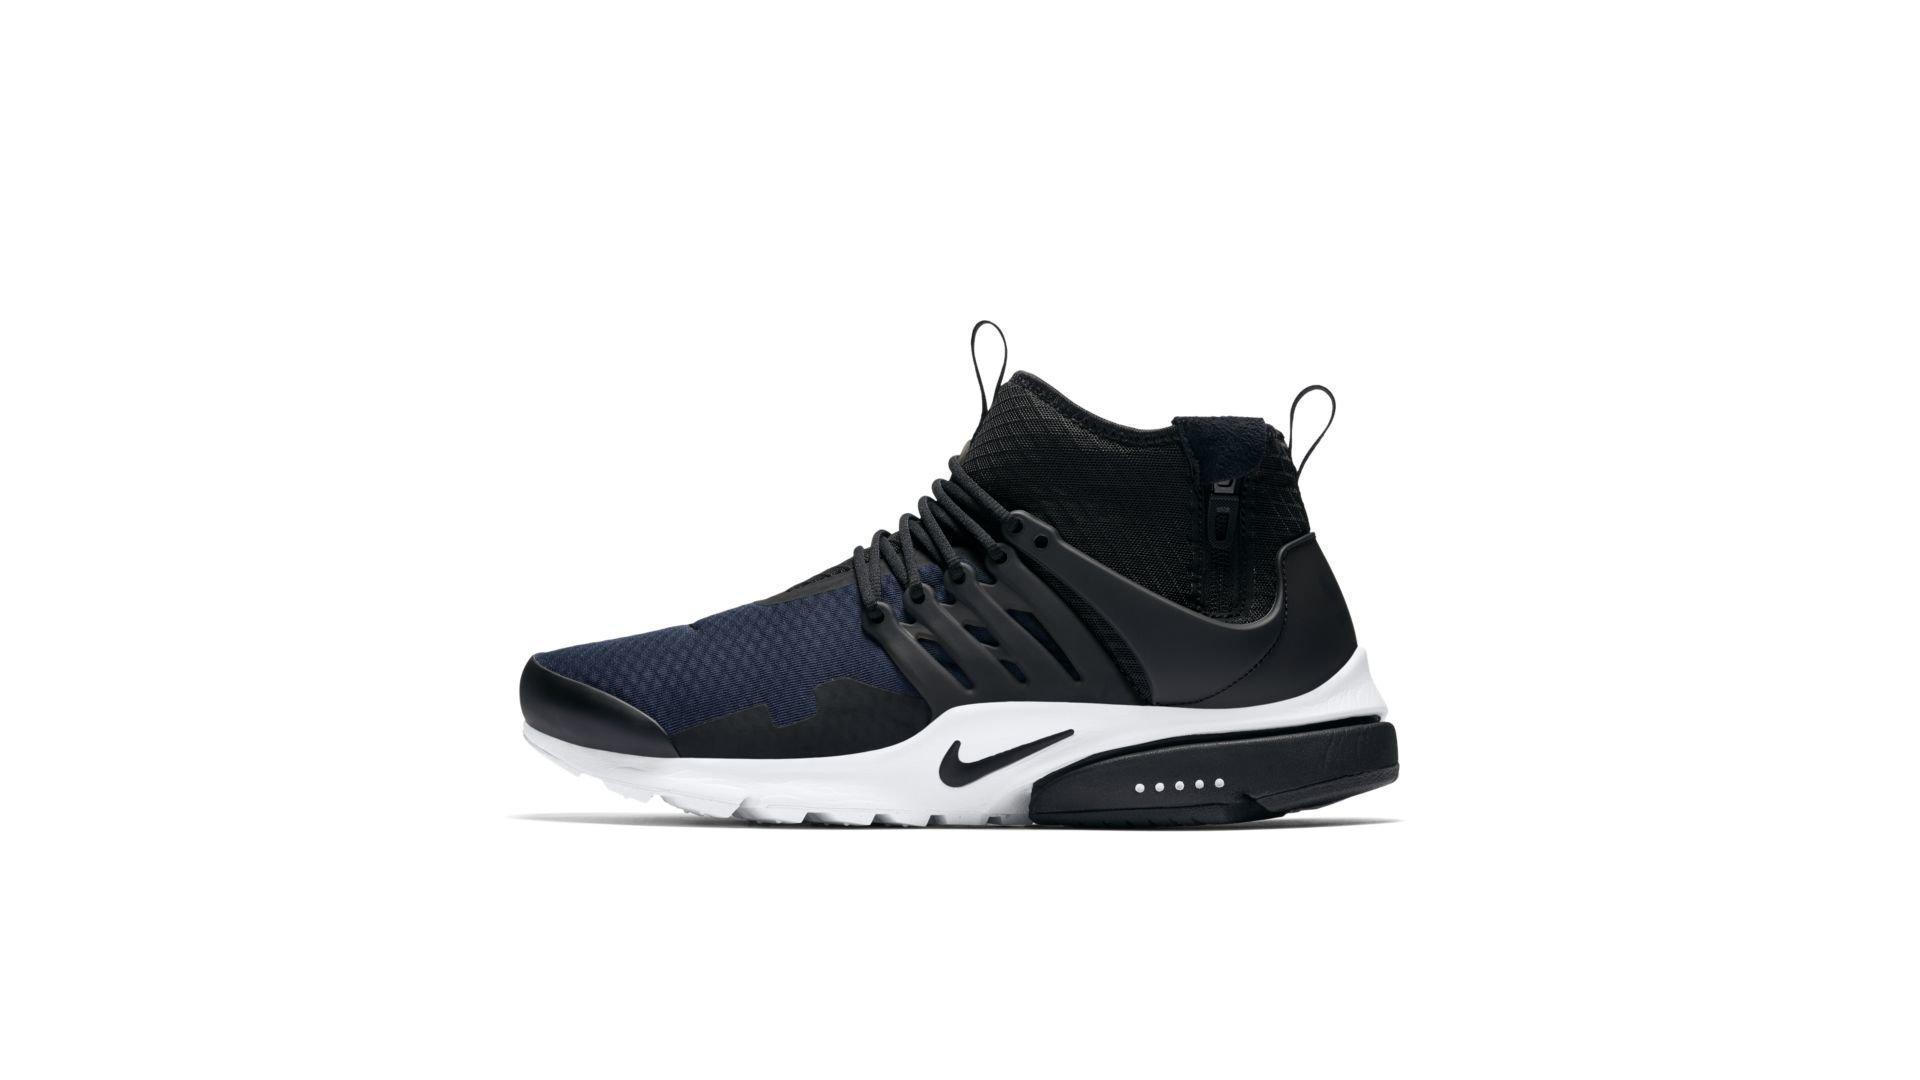 Nike Air Presto Mid Obsidian Black (AA0868-005)